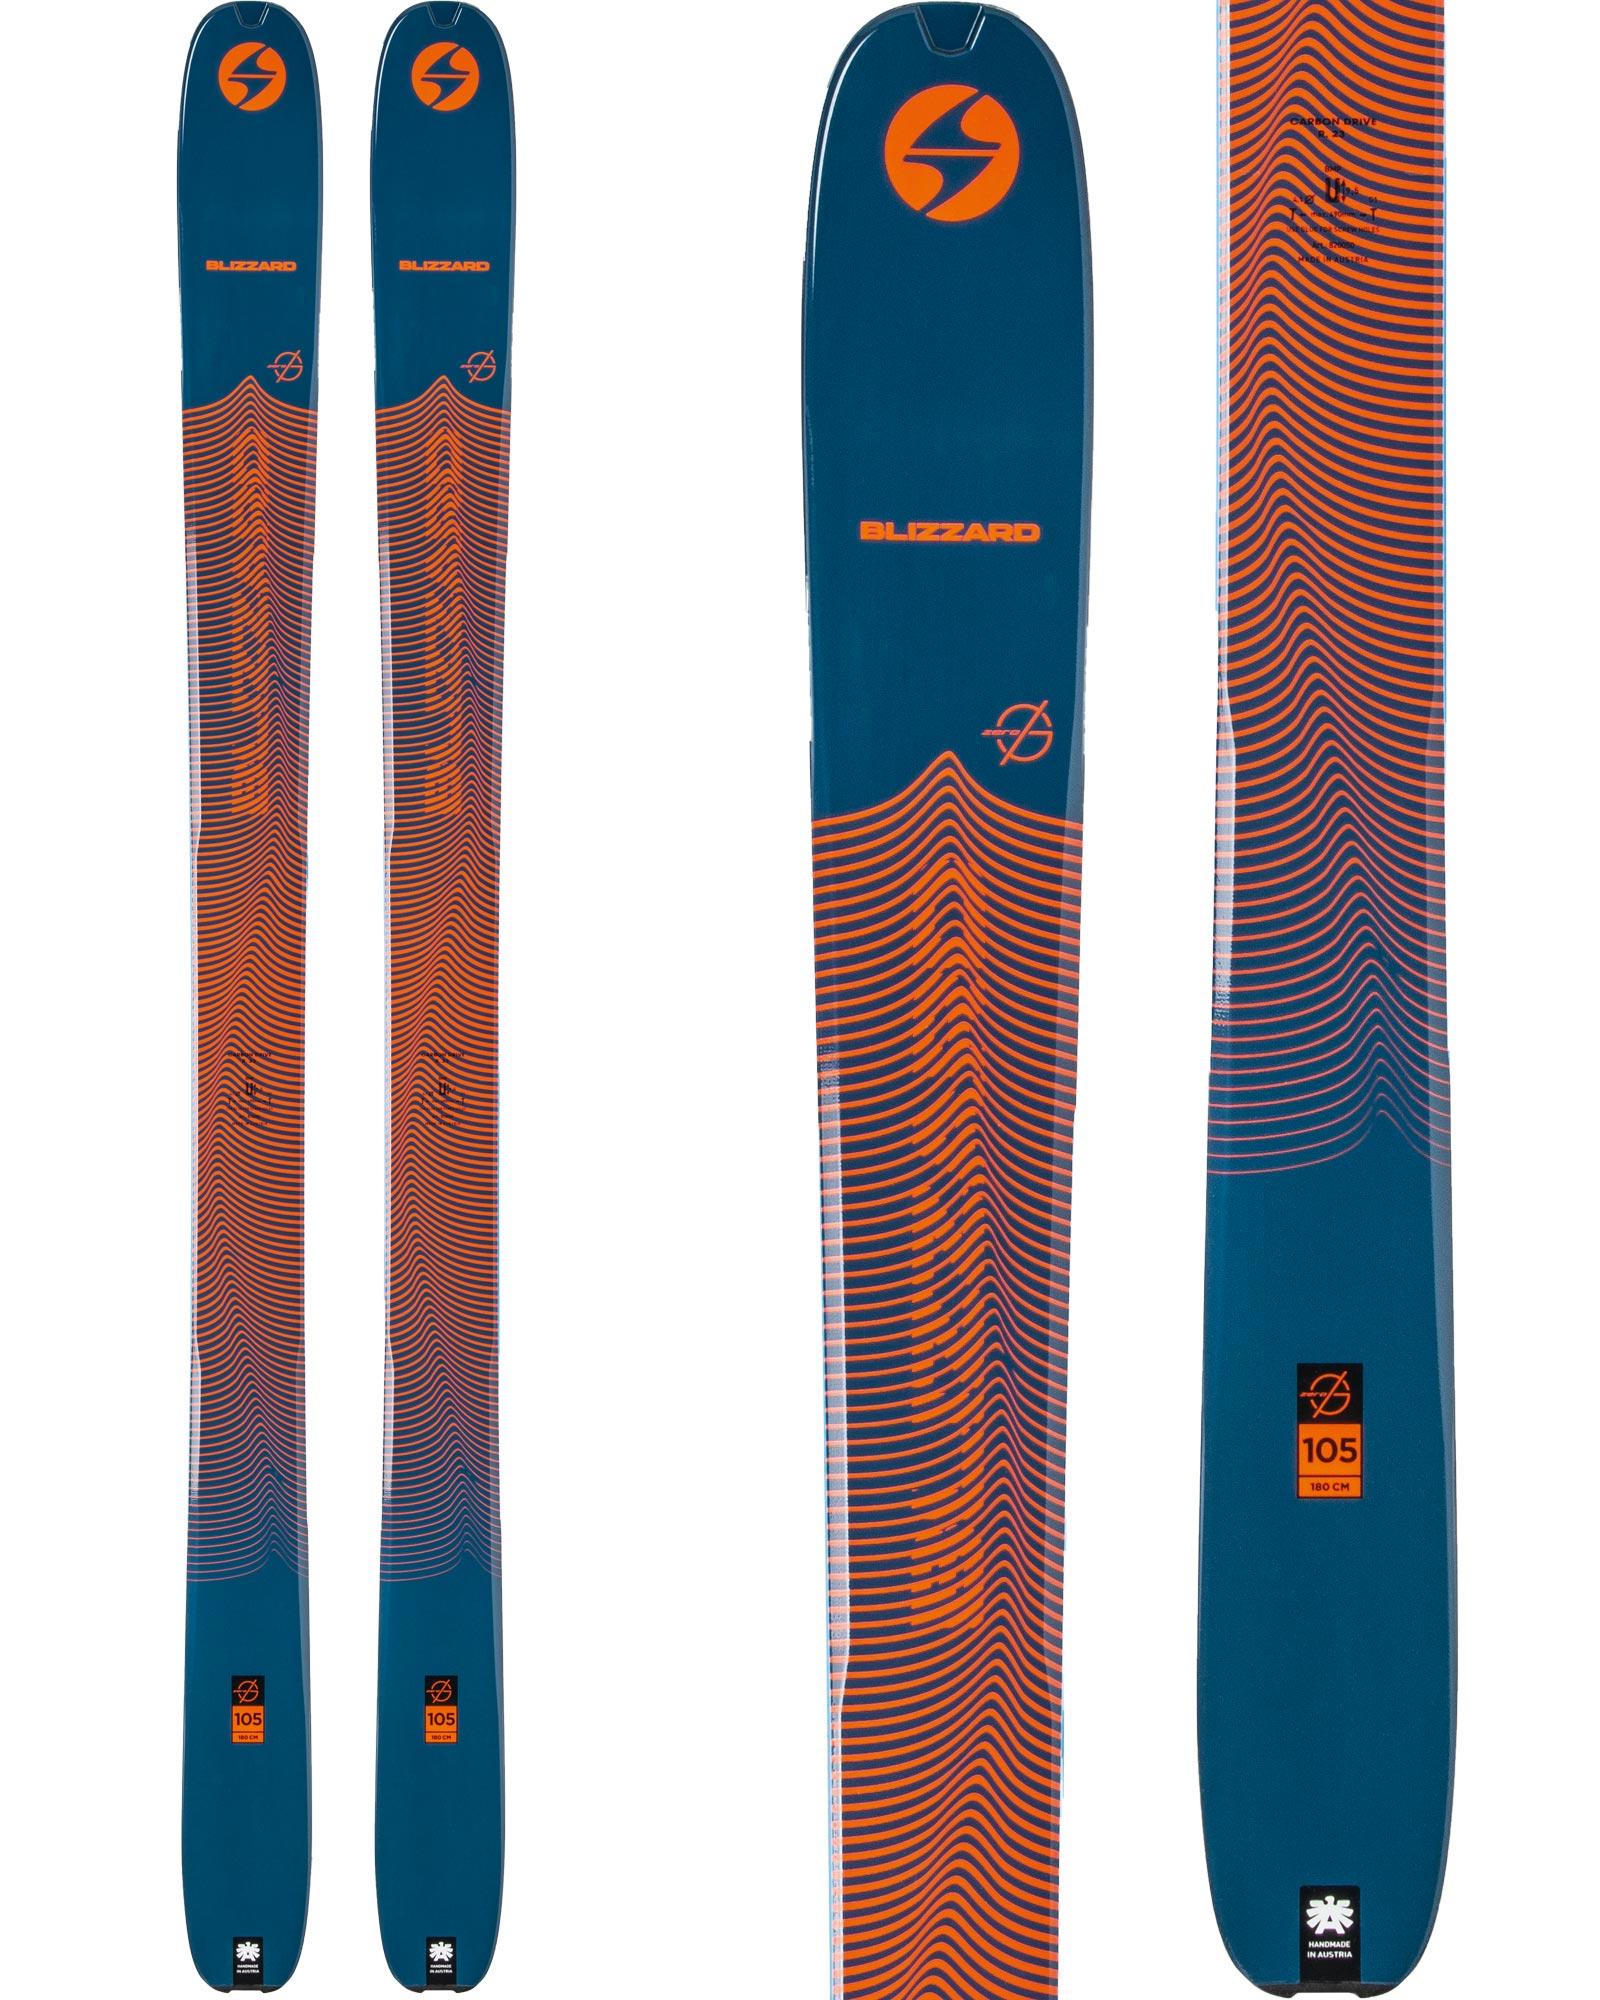 Blizzard Men's Zero G 105 Backcountry Skis 2020 / 2021 0